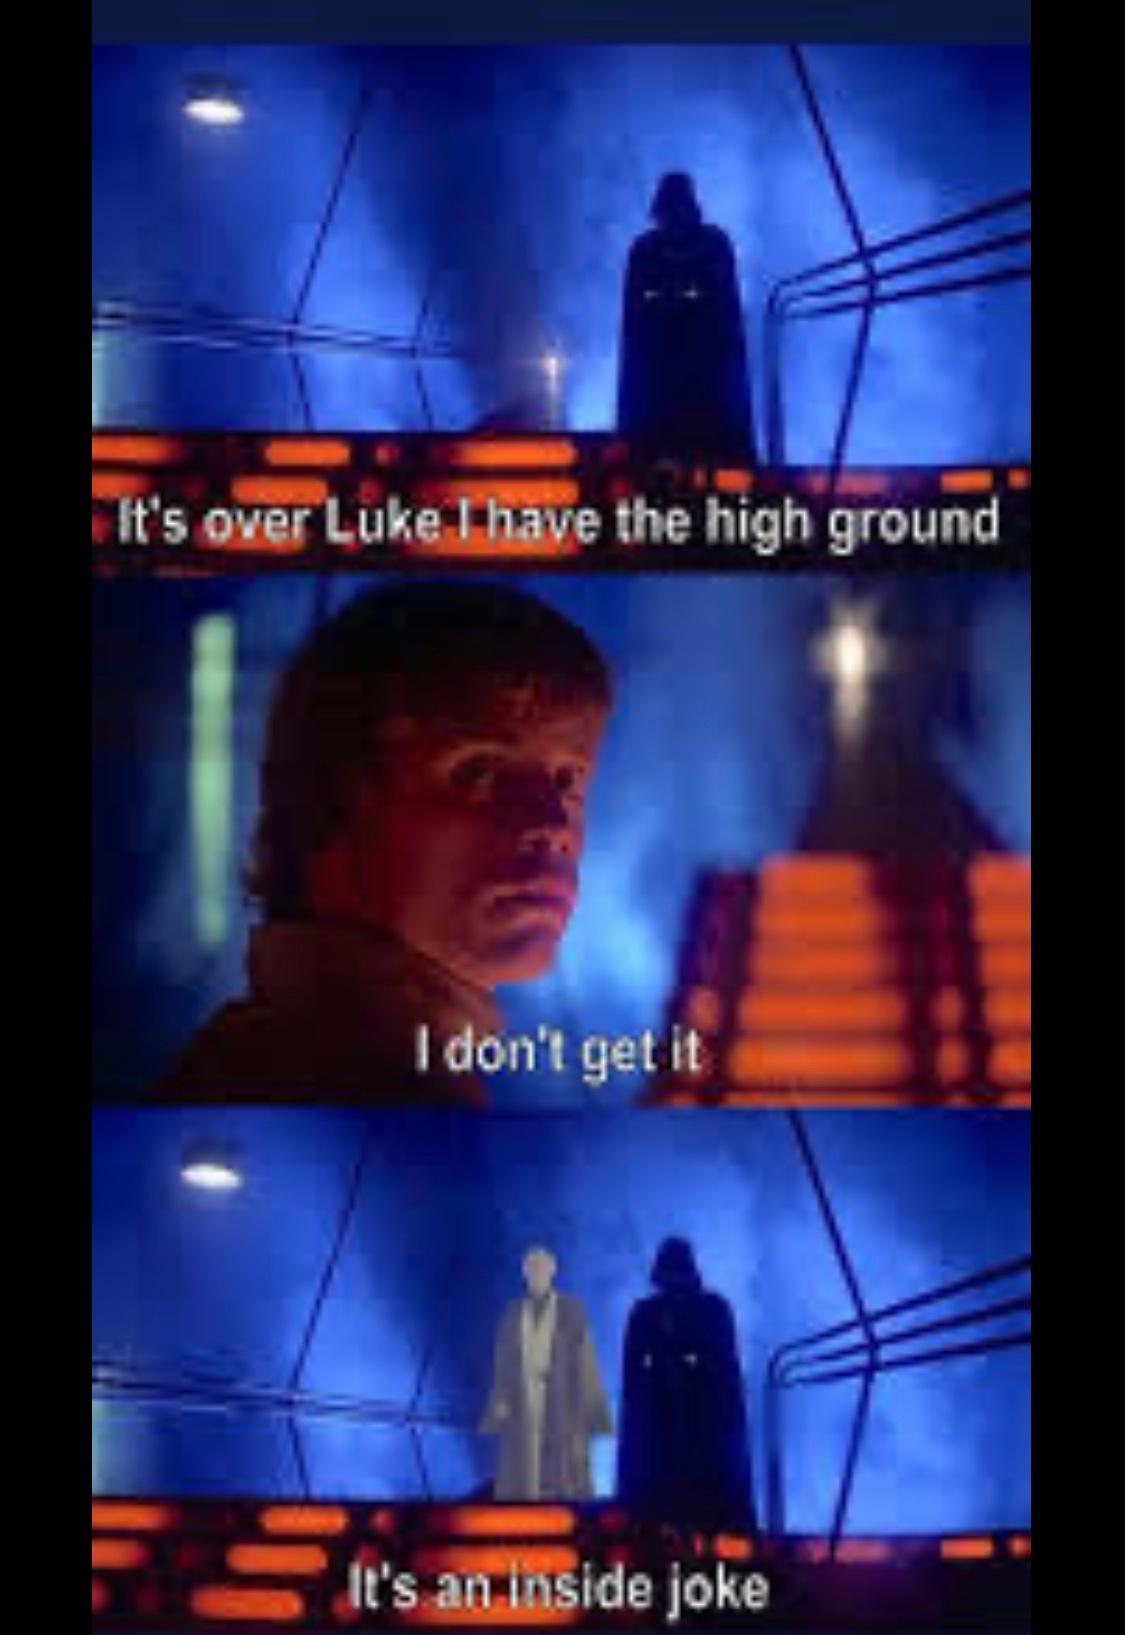 the high ground - meme